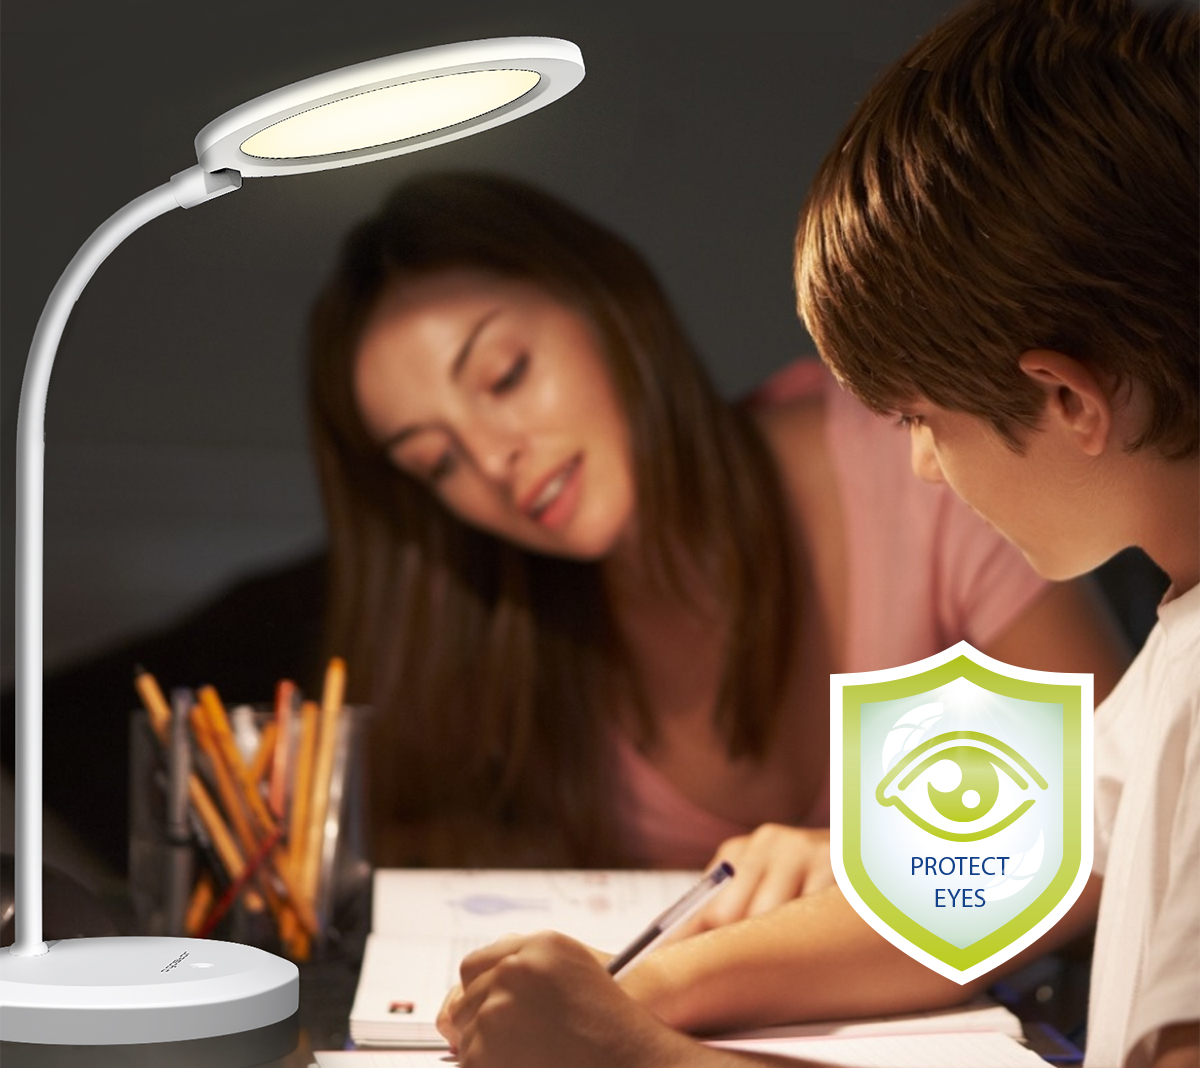 Jaka lampka na biurko dla dziecka